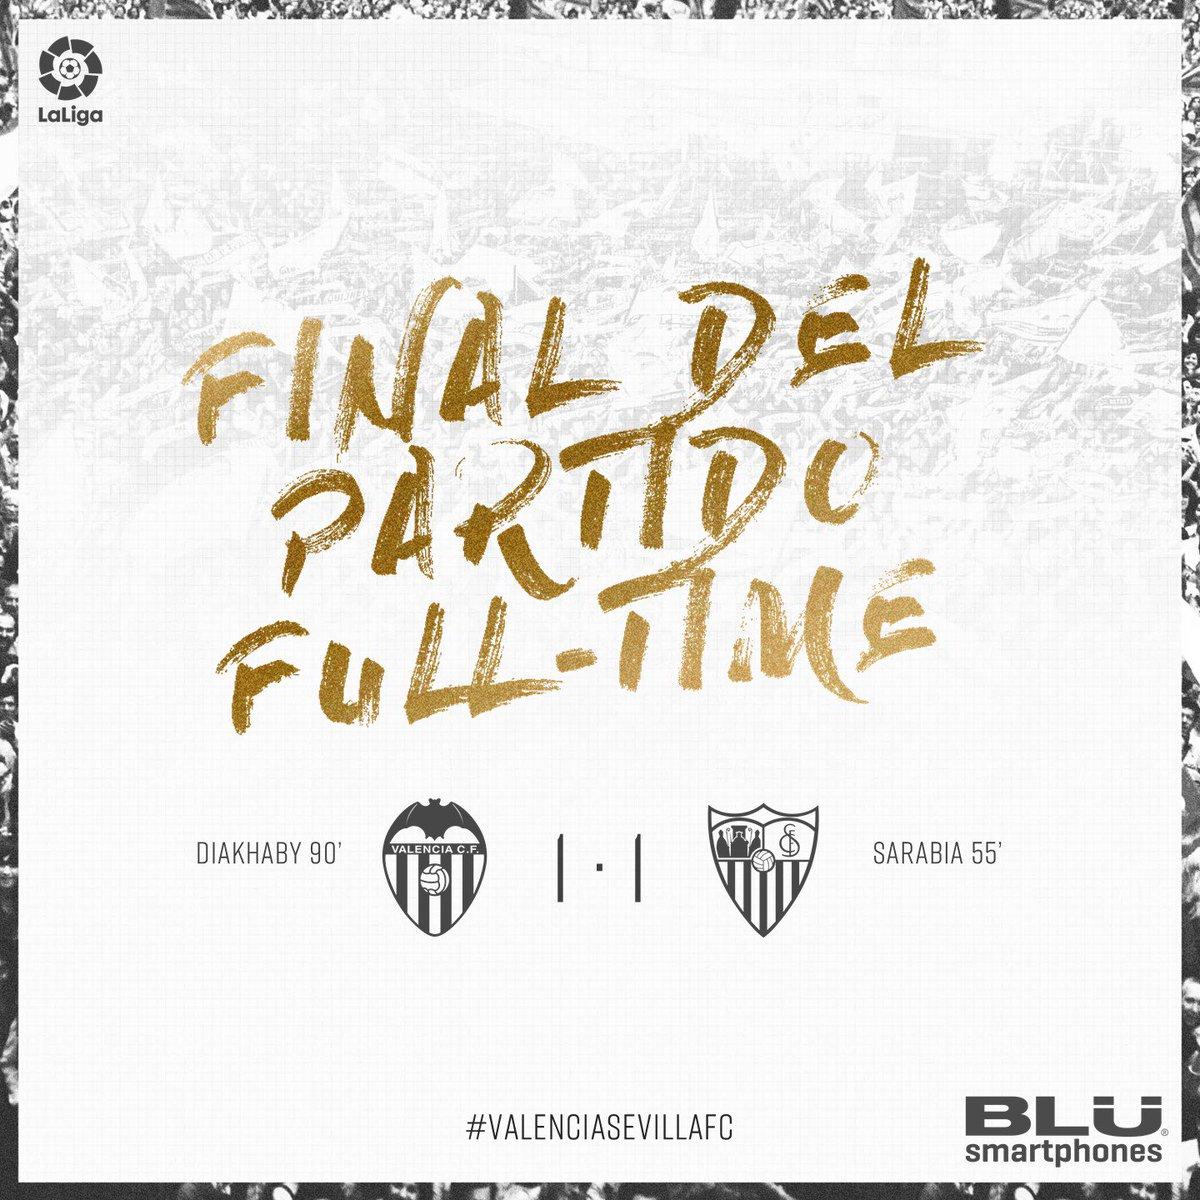 FINAL DEL PARTIDO 1-1 ⚽ | 90' 🕰| #ValenciaSevillaFC